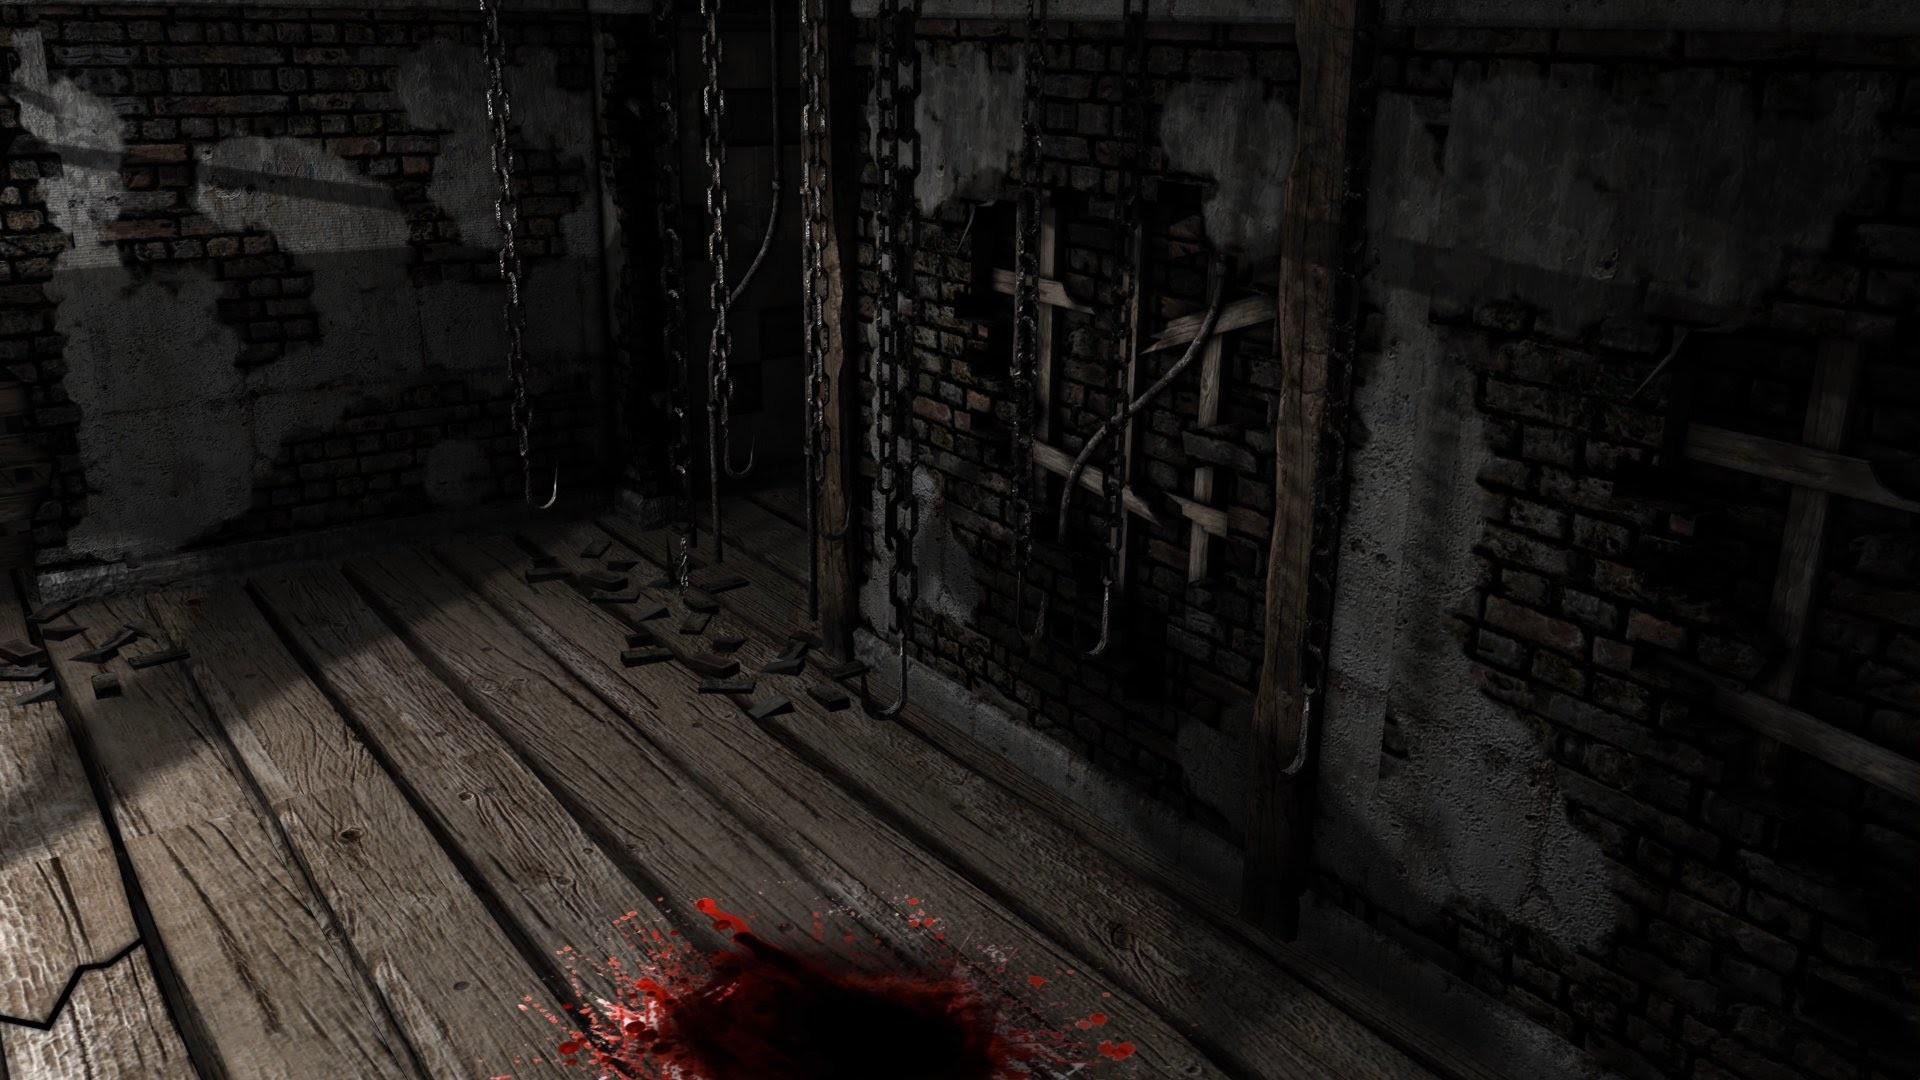 horror background images images